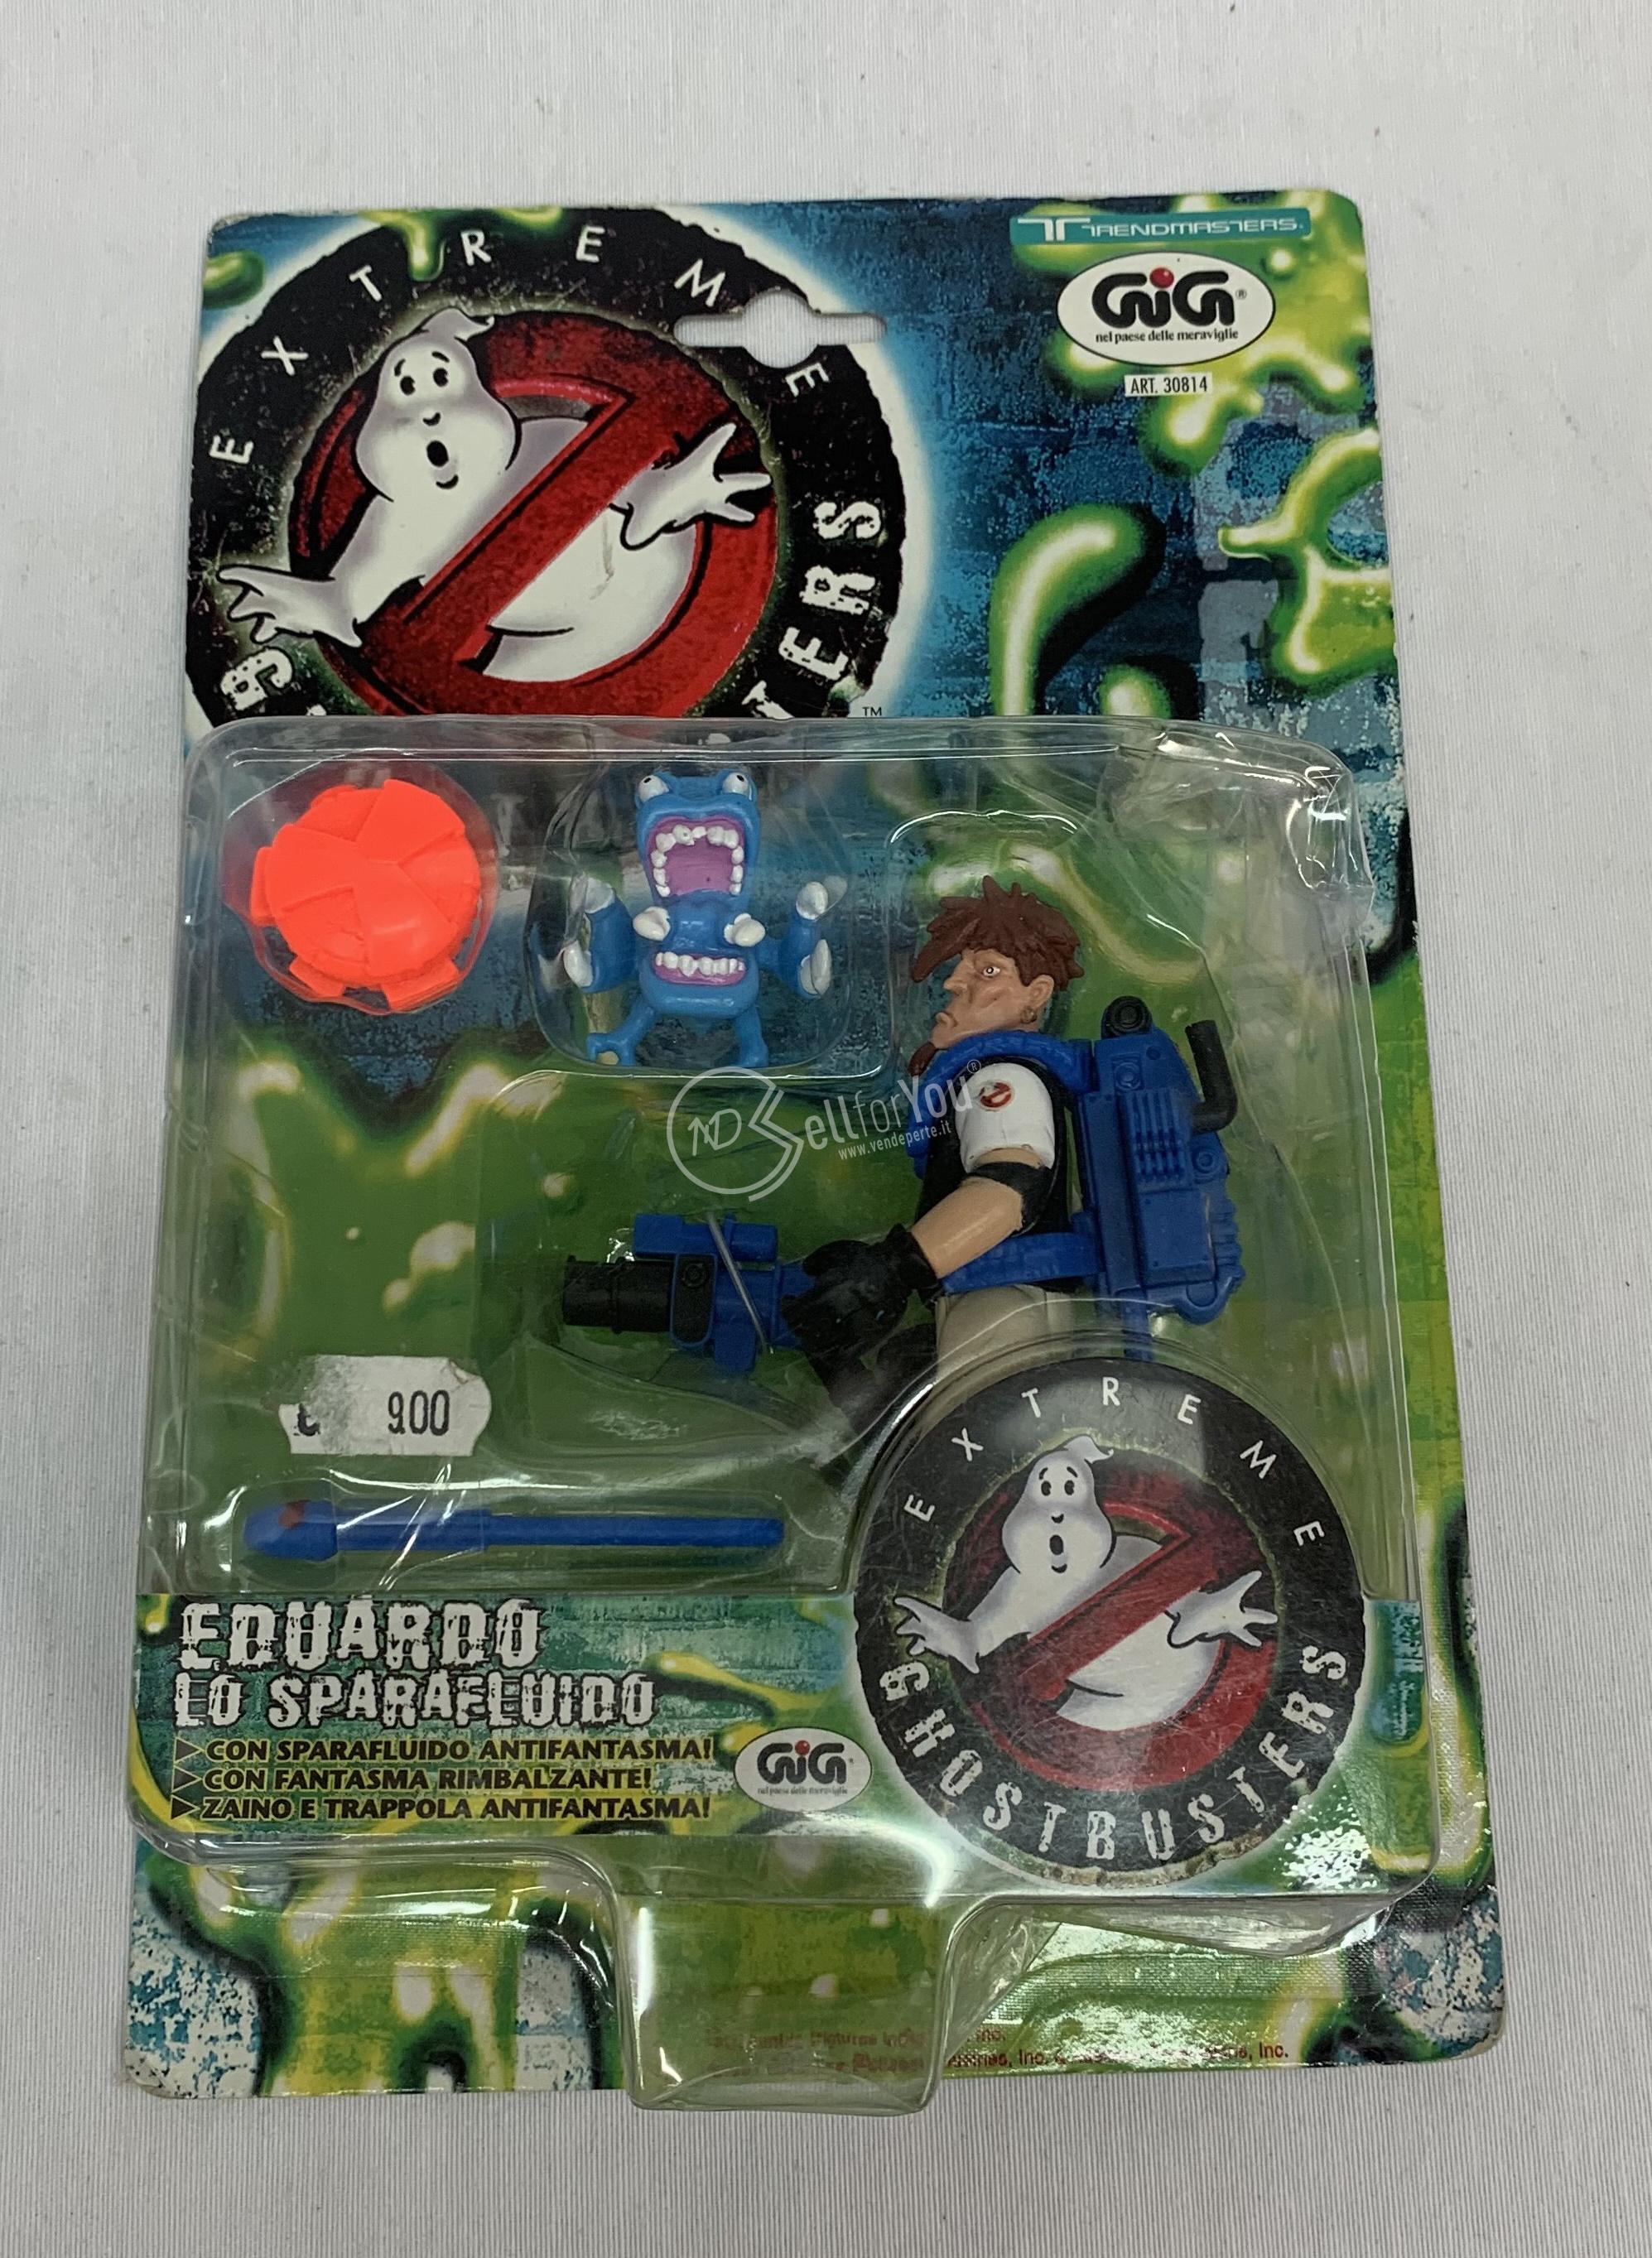 sellforyou immagine default articolo correlato non trovatoExtreme Ghostbuster Eduardo lo sparafluido Gig 30814